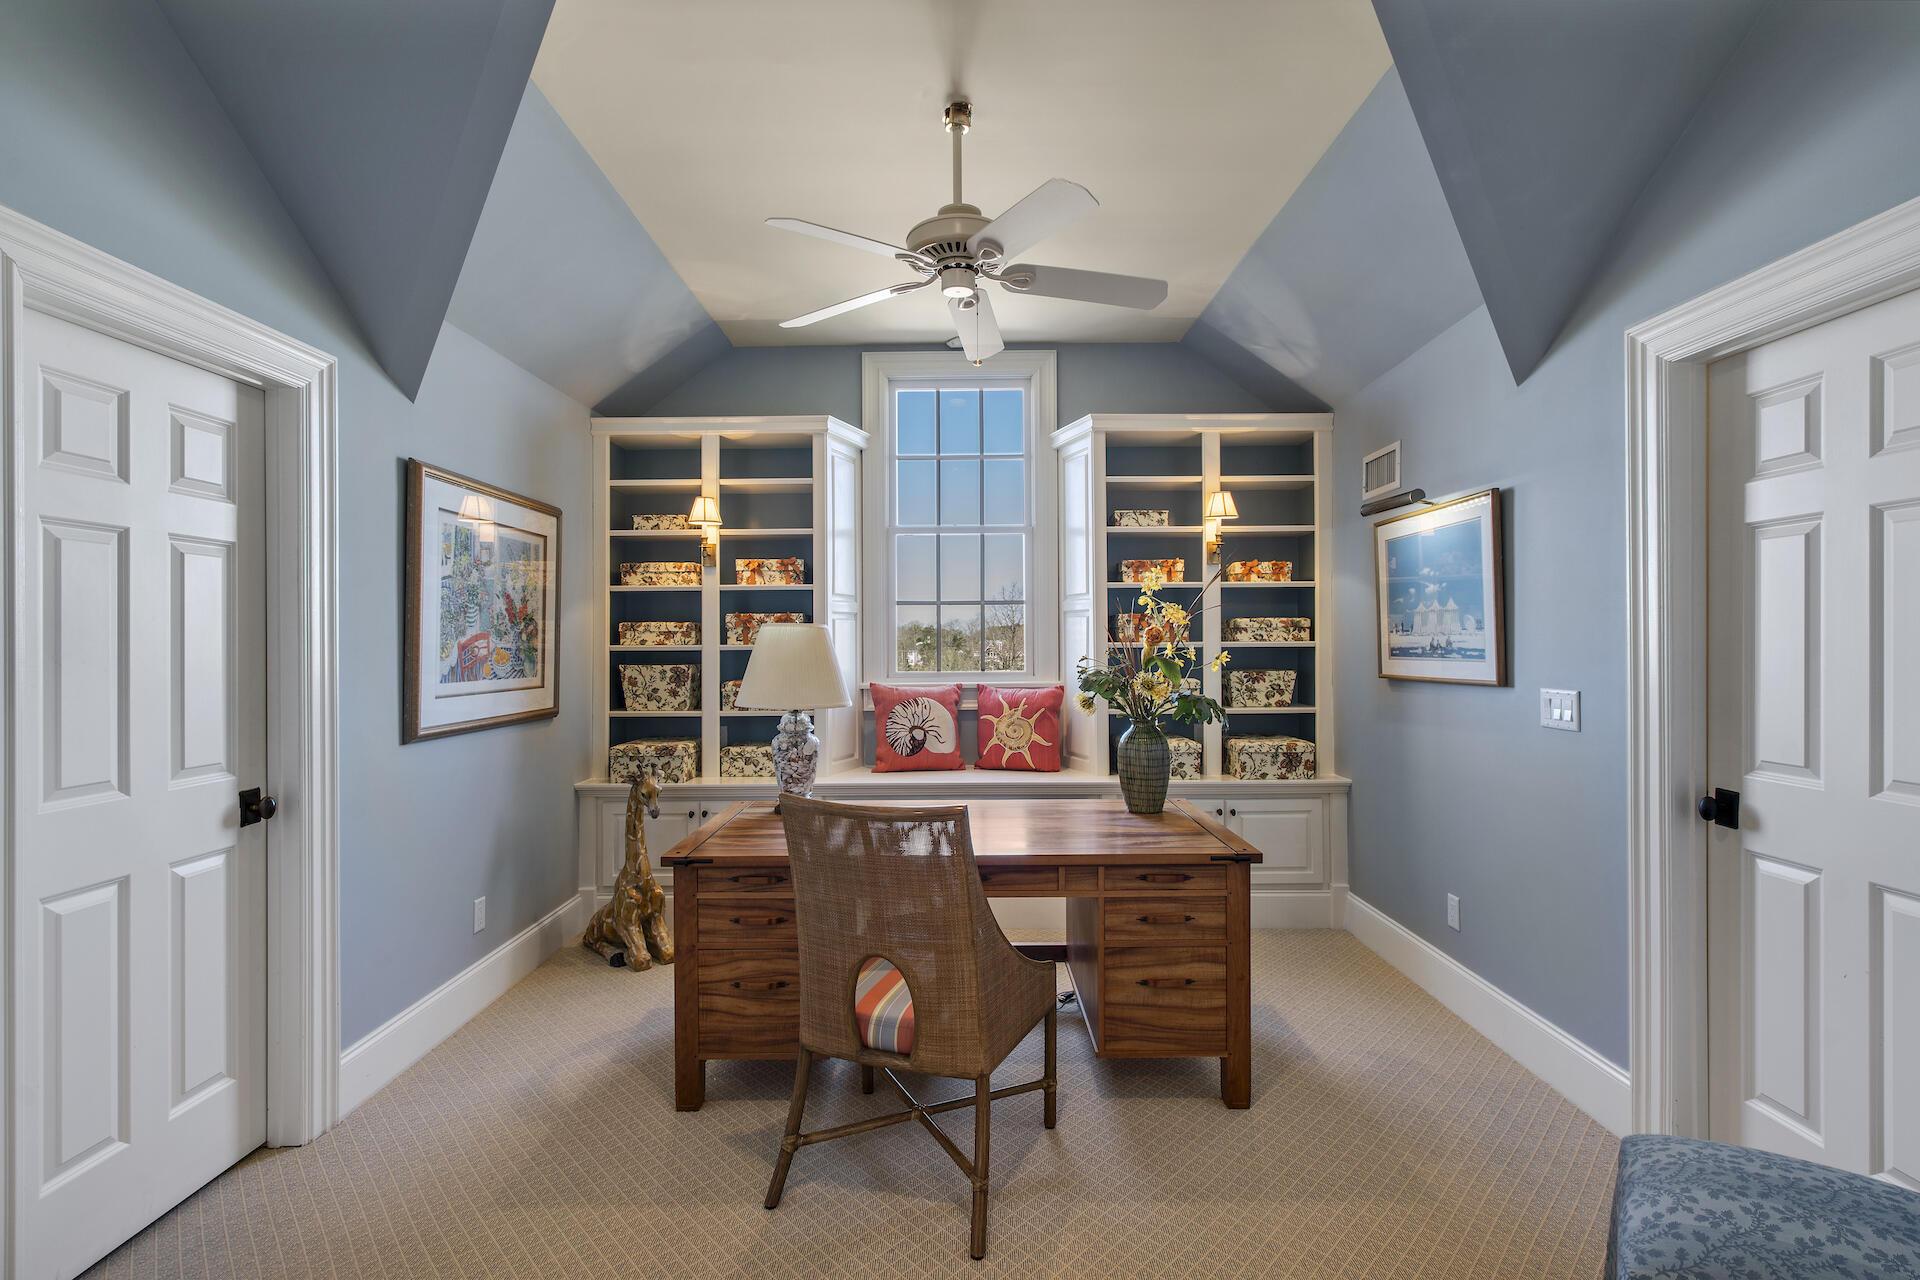 Daniel Island Homes For Sale - 623 Island Park, Charleston, SC - 6